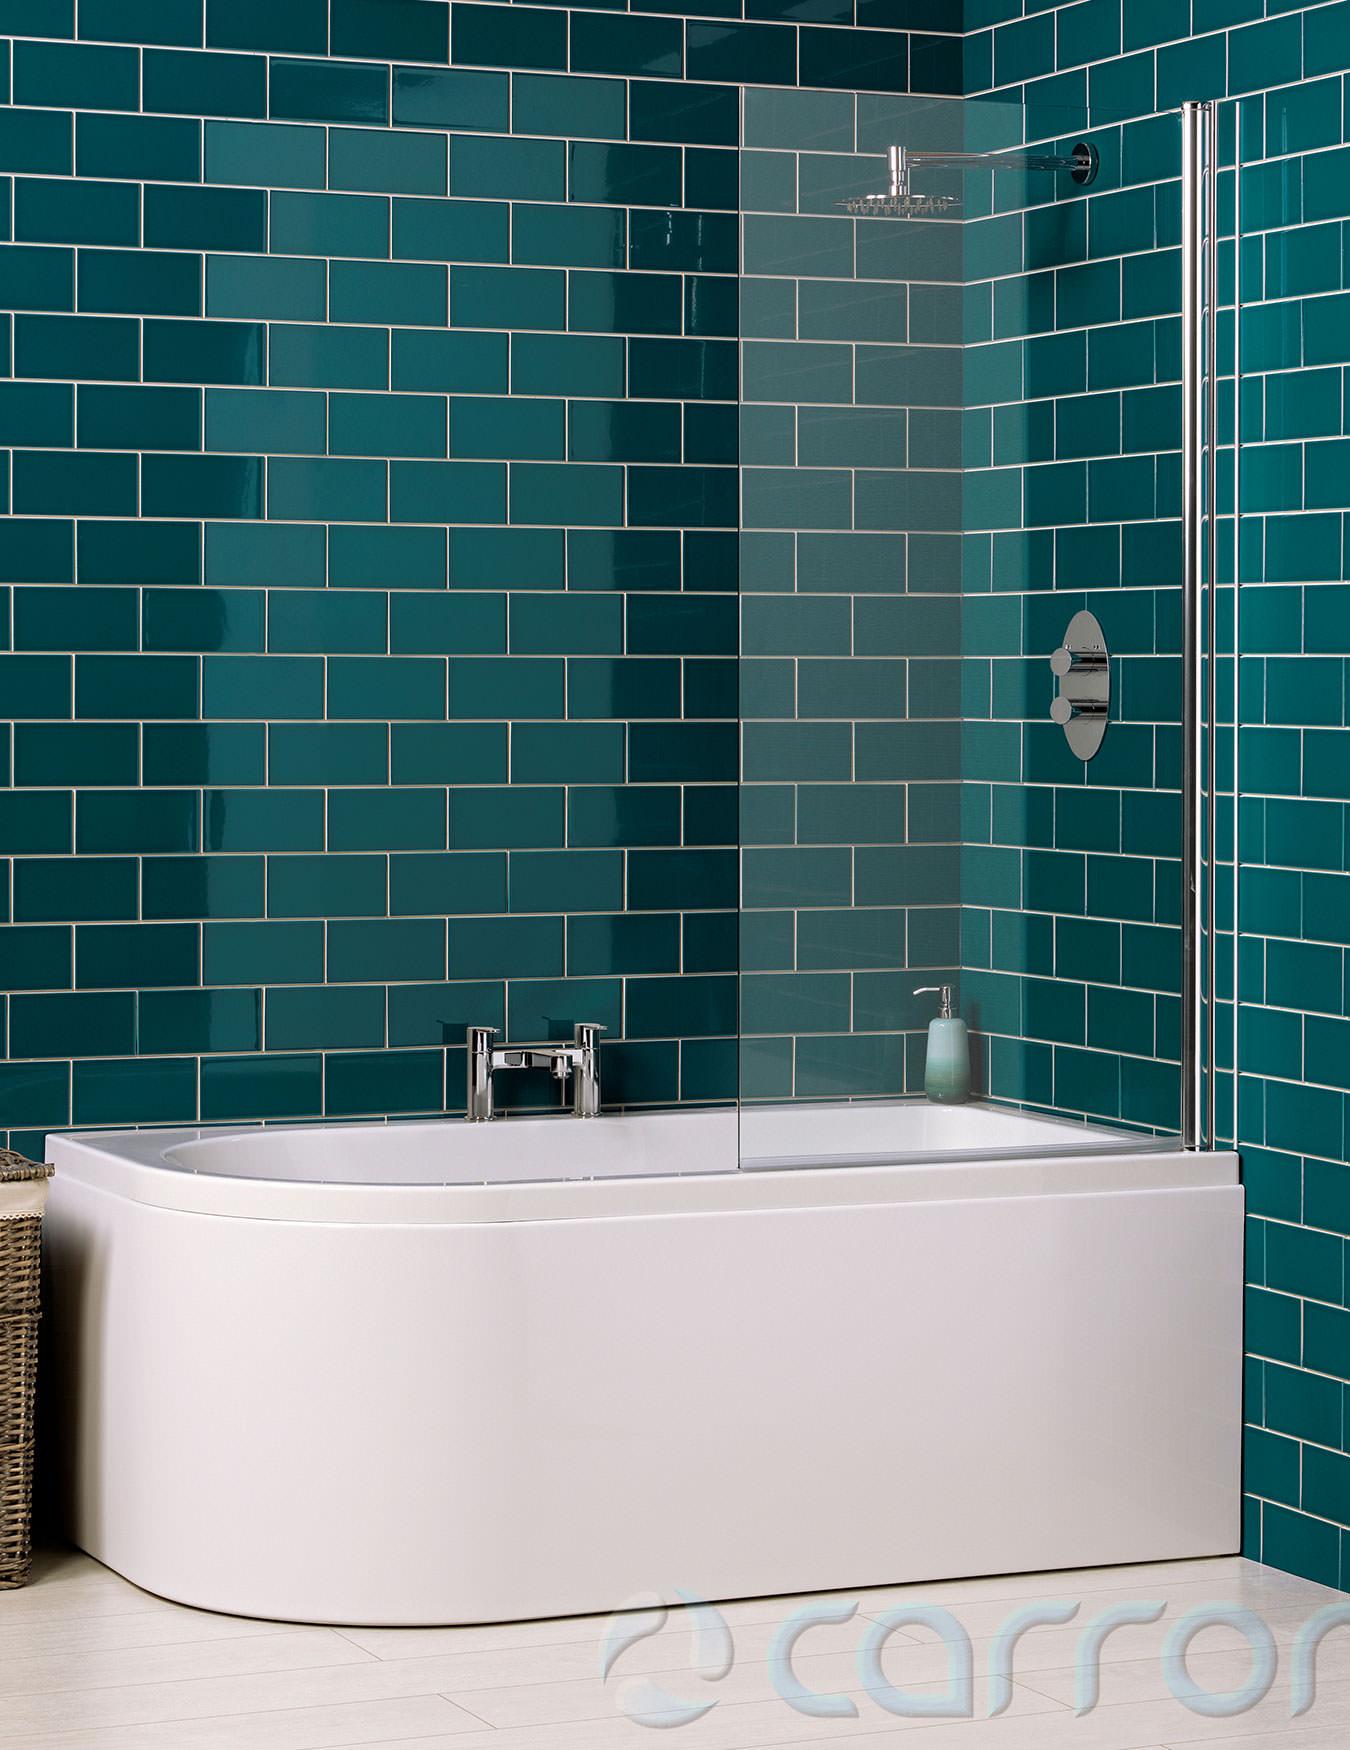 Carron Status 5mm Acrylic Shower Bath 1550 x 850mm - Left Handed